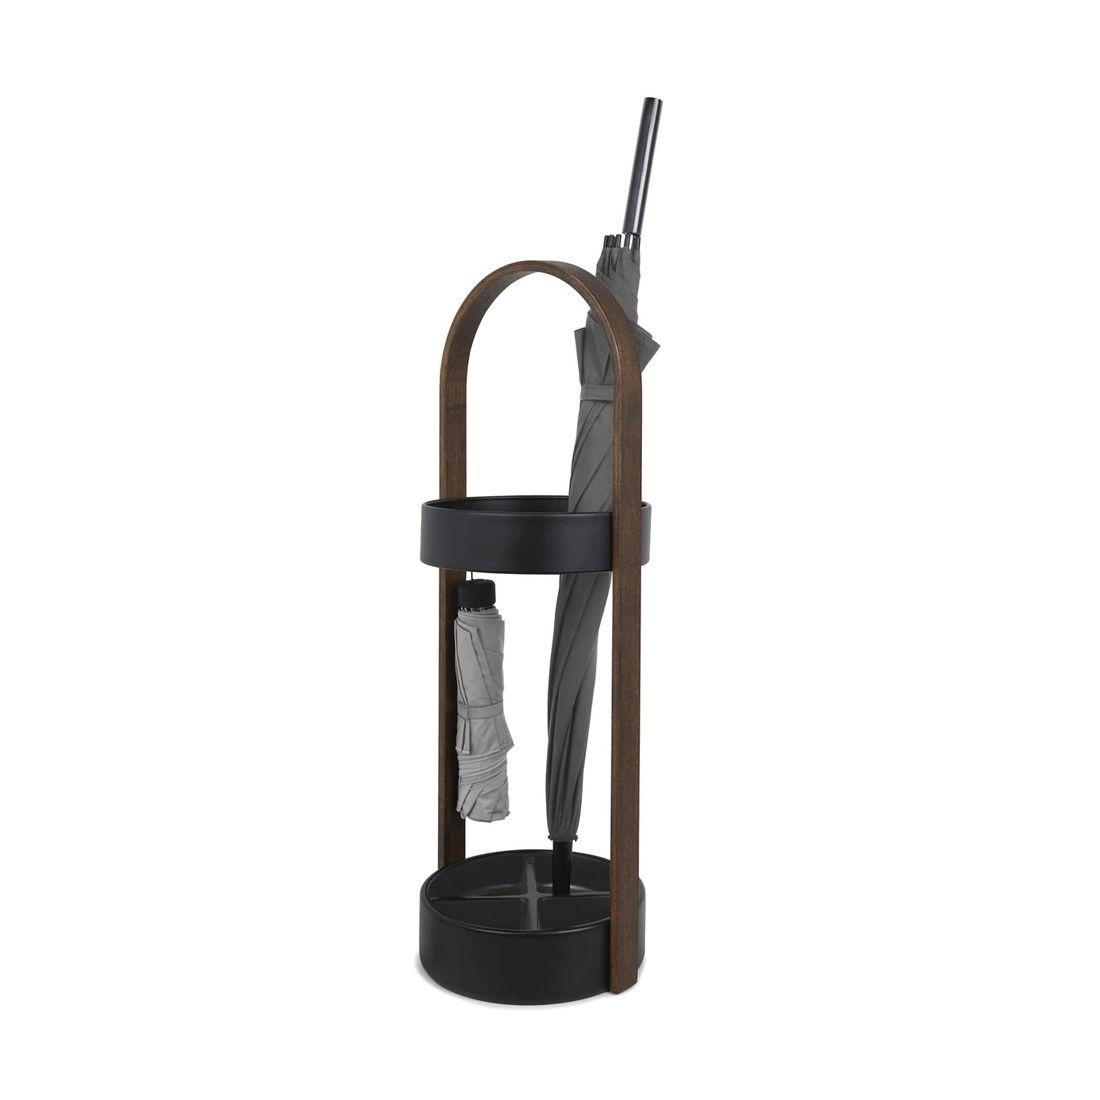 Hub paraplubak Umbra zwart